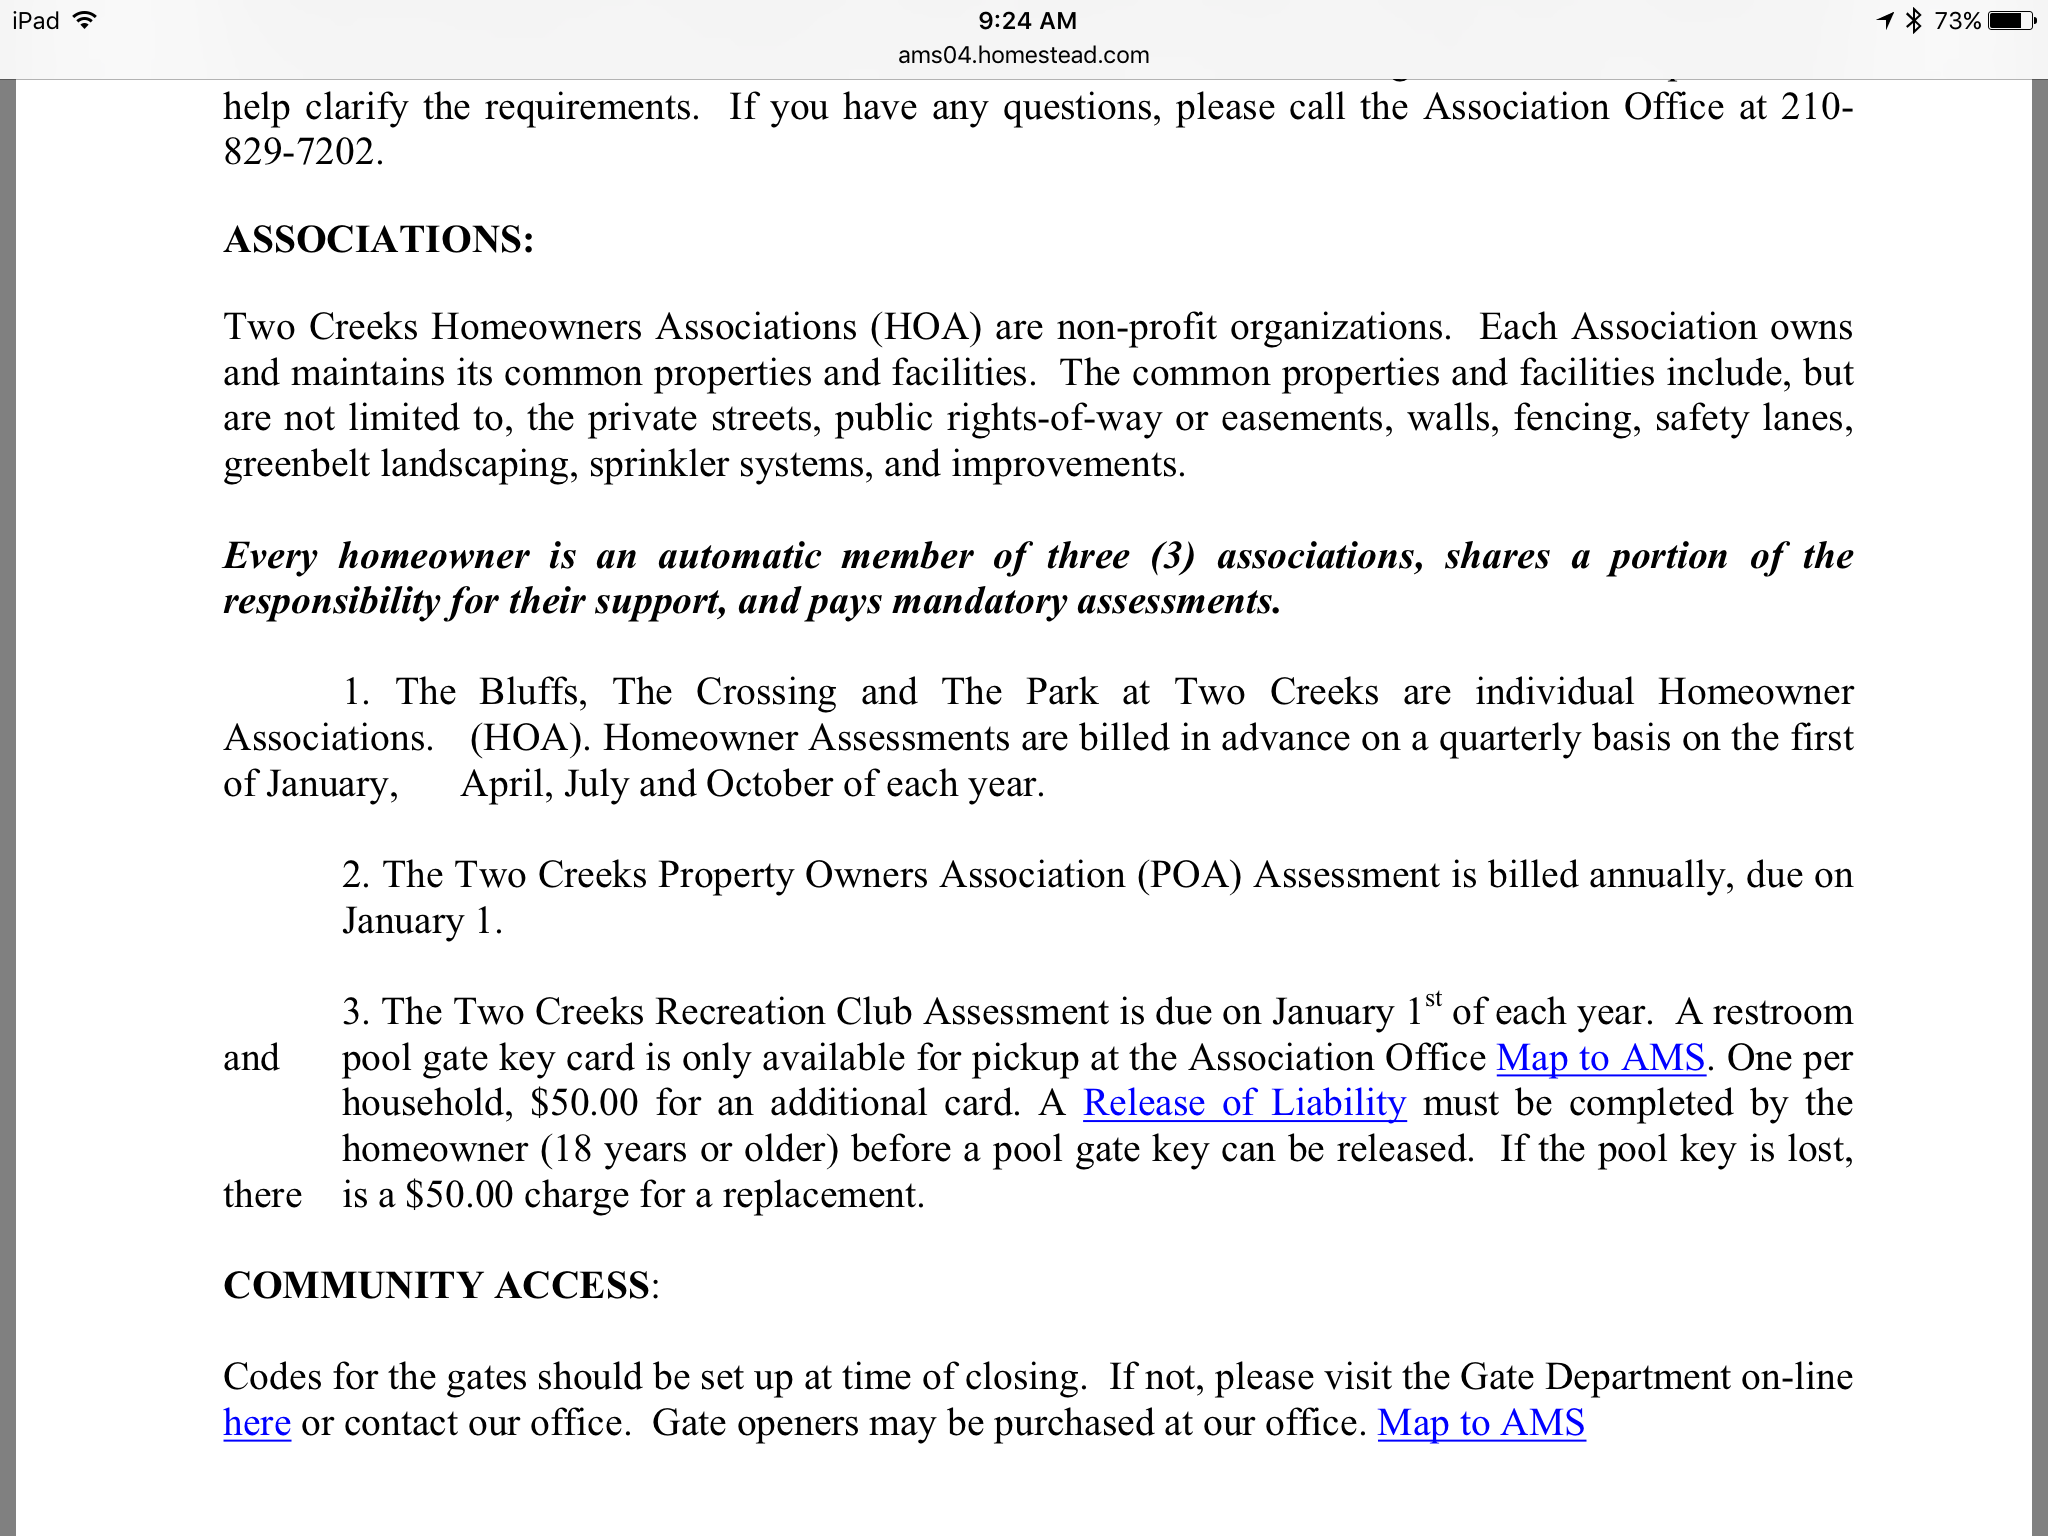 HOA: claim to the management company (sample)